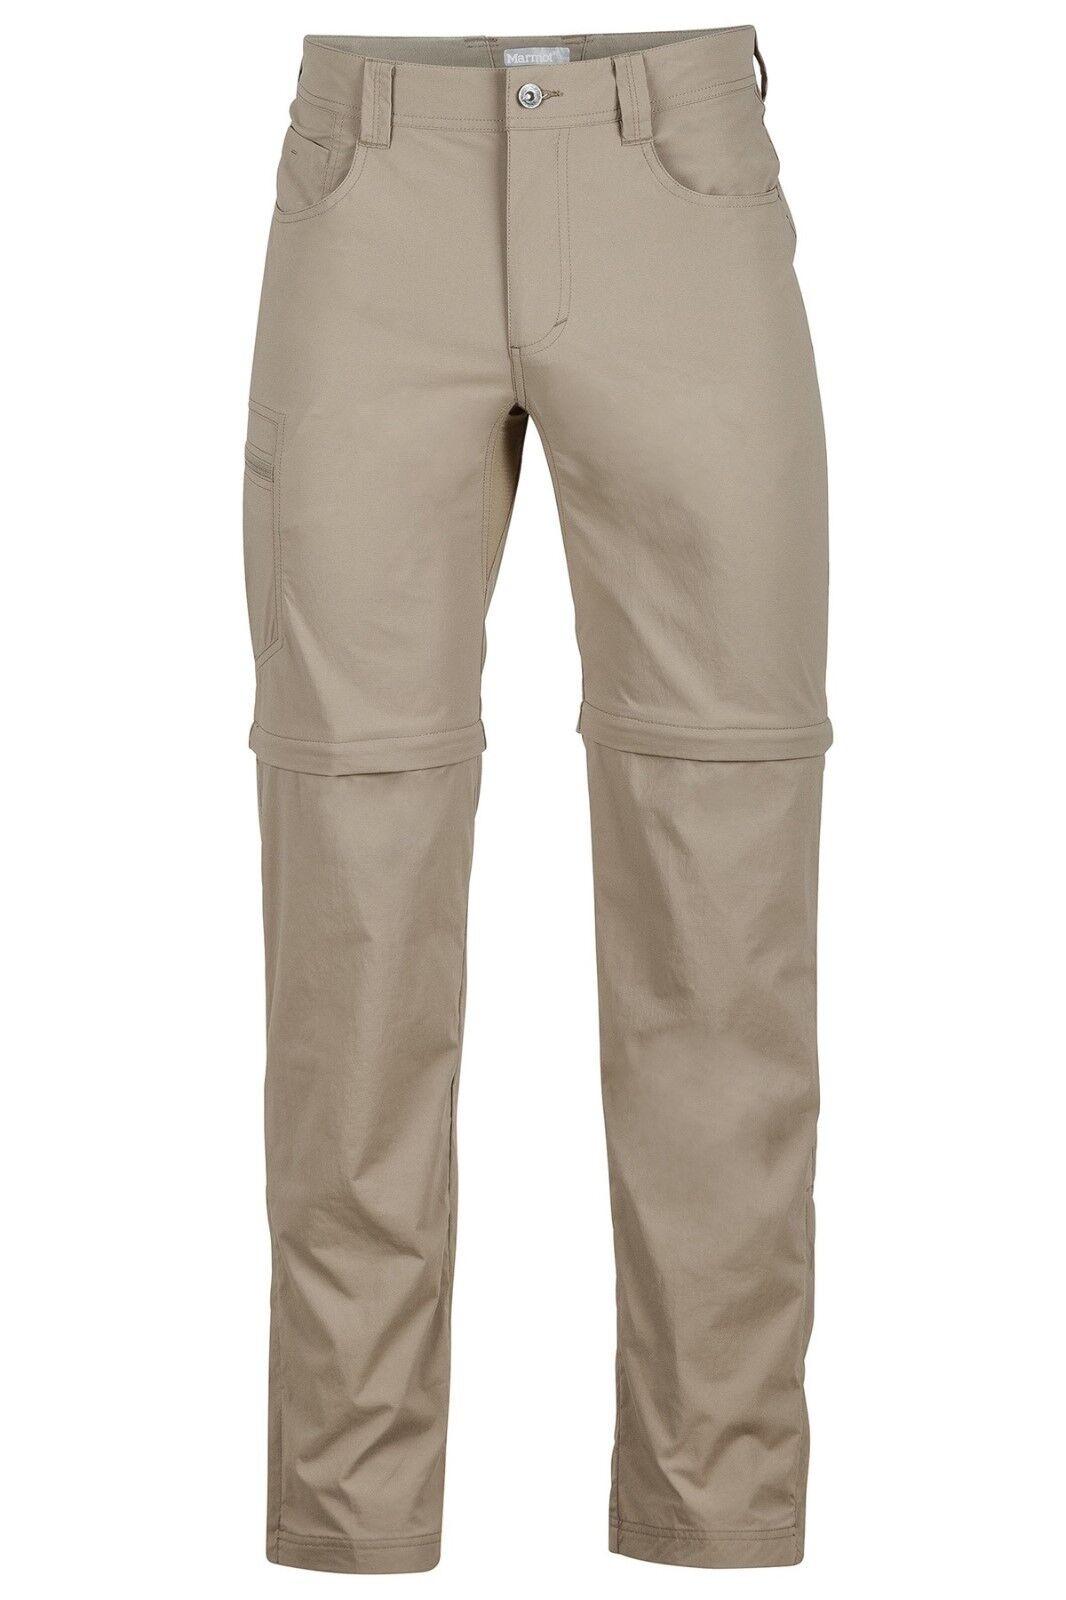 Marmot Transcend Convertible Pant Men, Zip-Off Herrenhose, light khaki